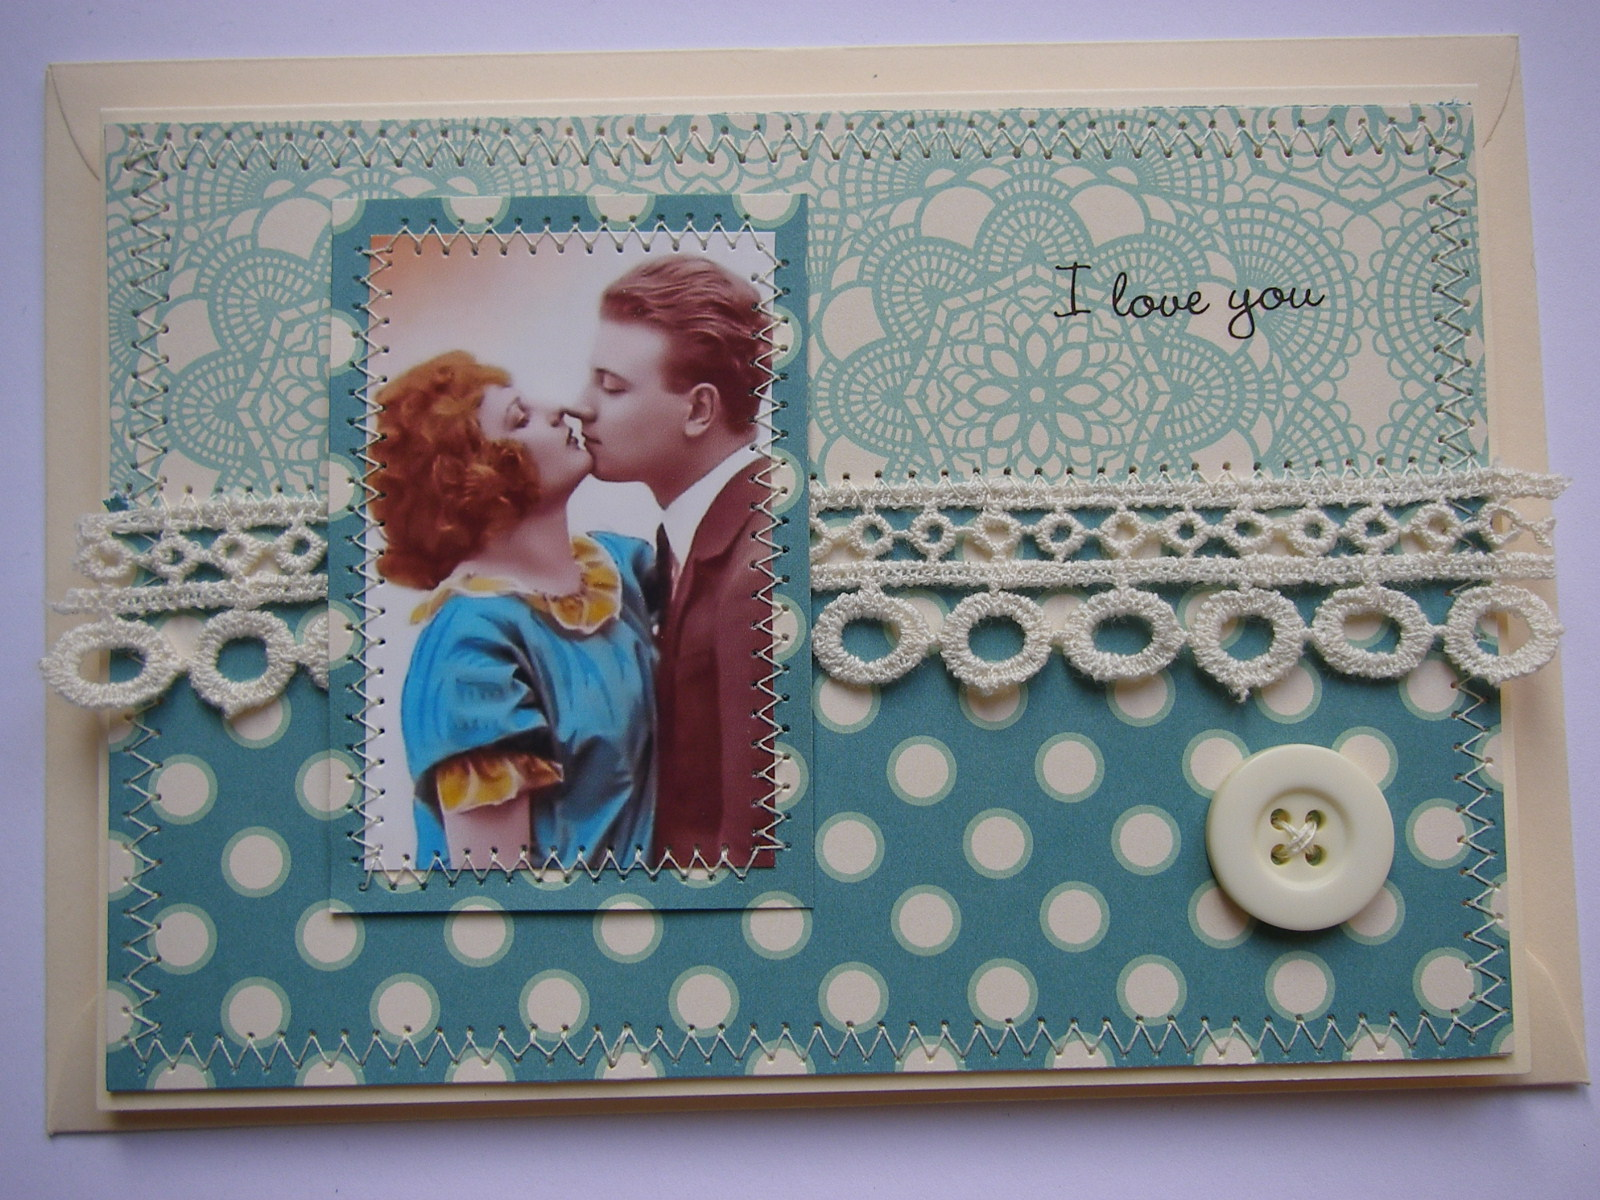 *i love you* OOAK Handmade Vintage Style Anniversary/Valentine Card